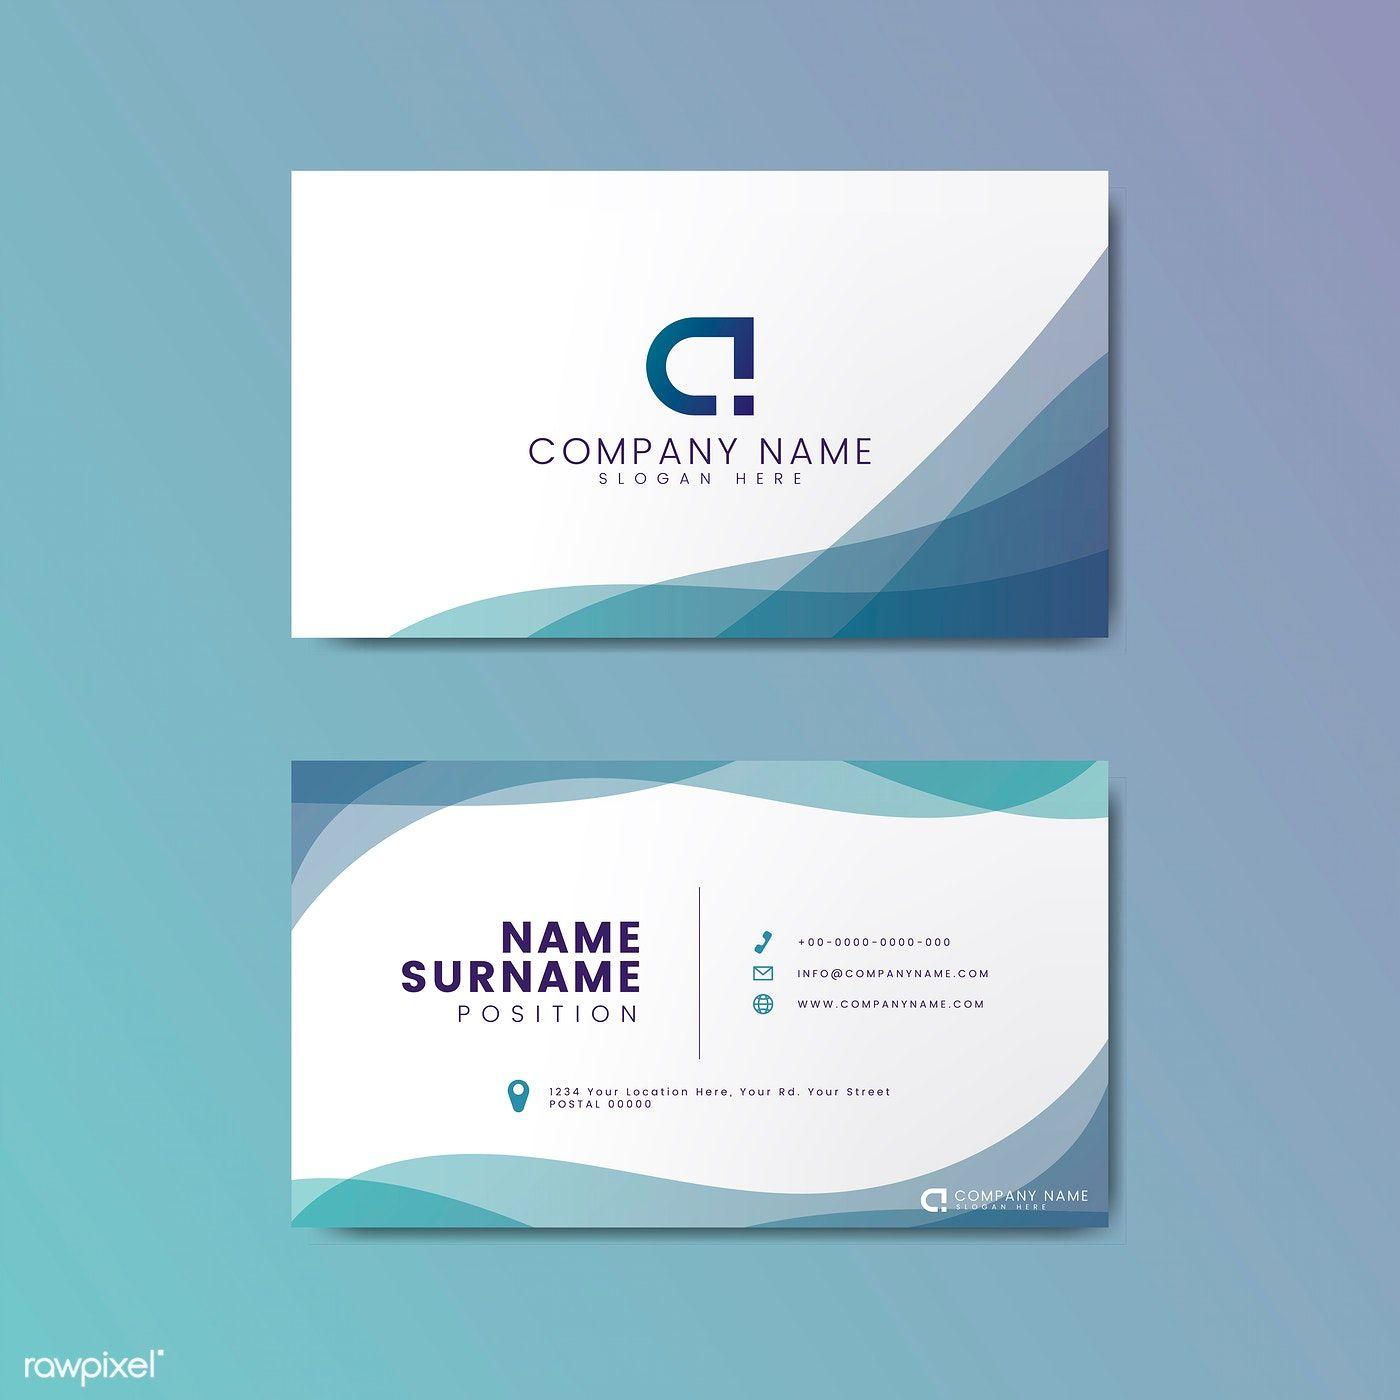 Modern Geometric Business Card Design Free Image By Rawpixel Com